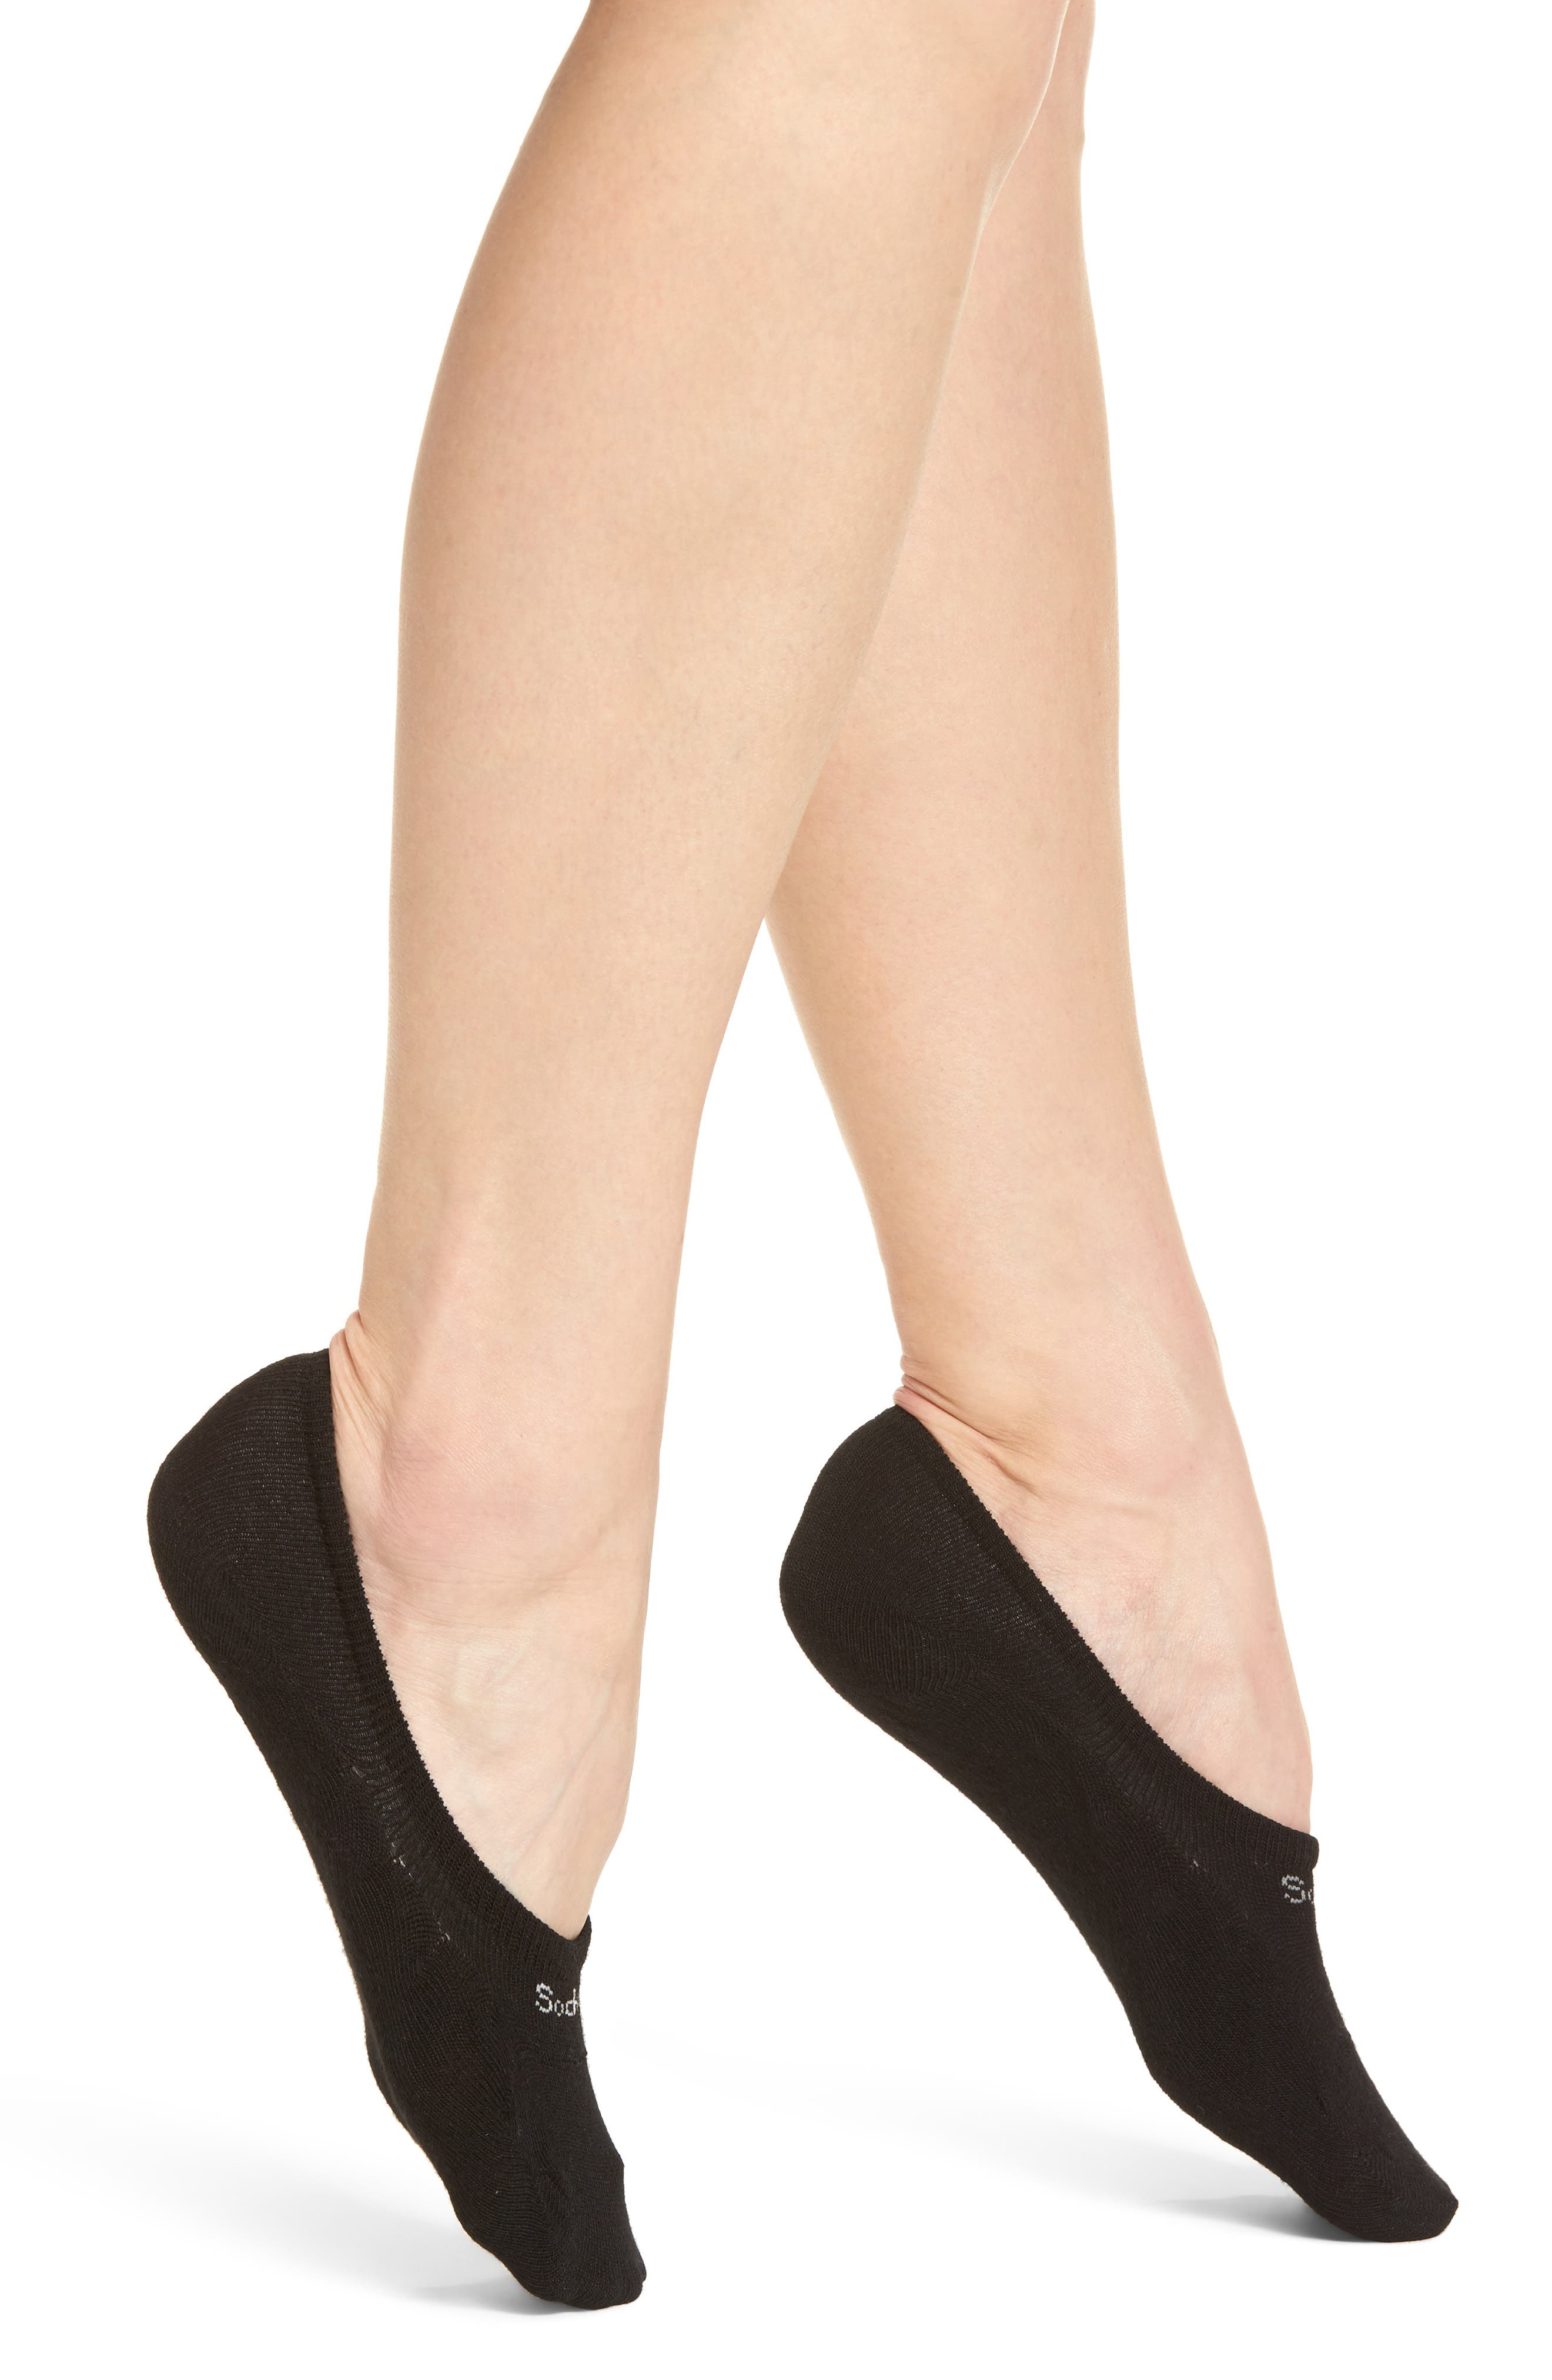 Undercover Liner Socks,                         Main,                         color, Black